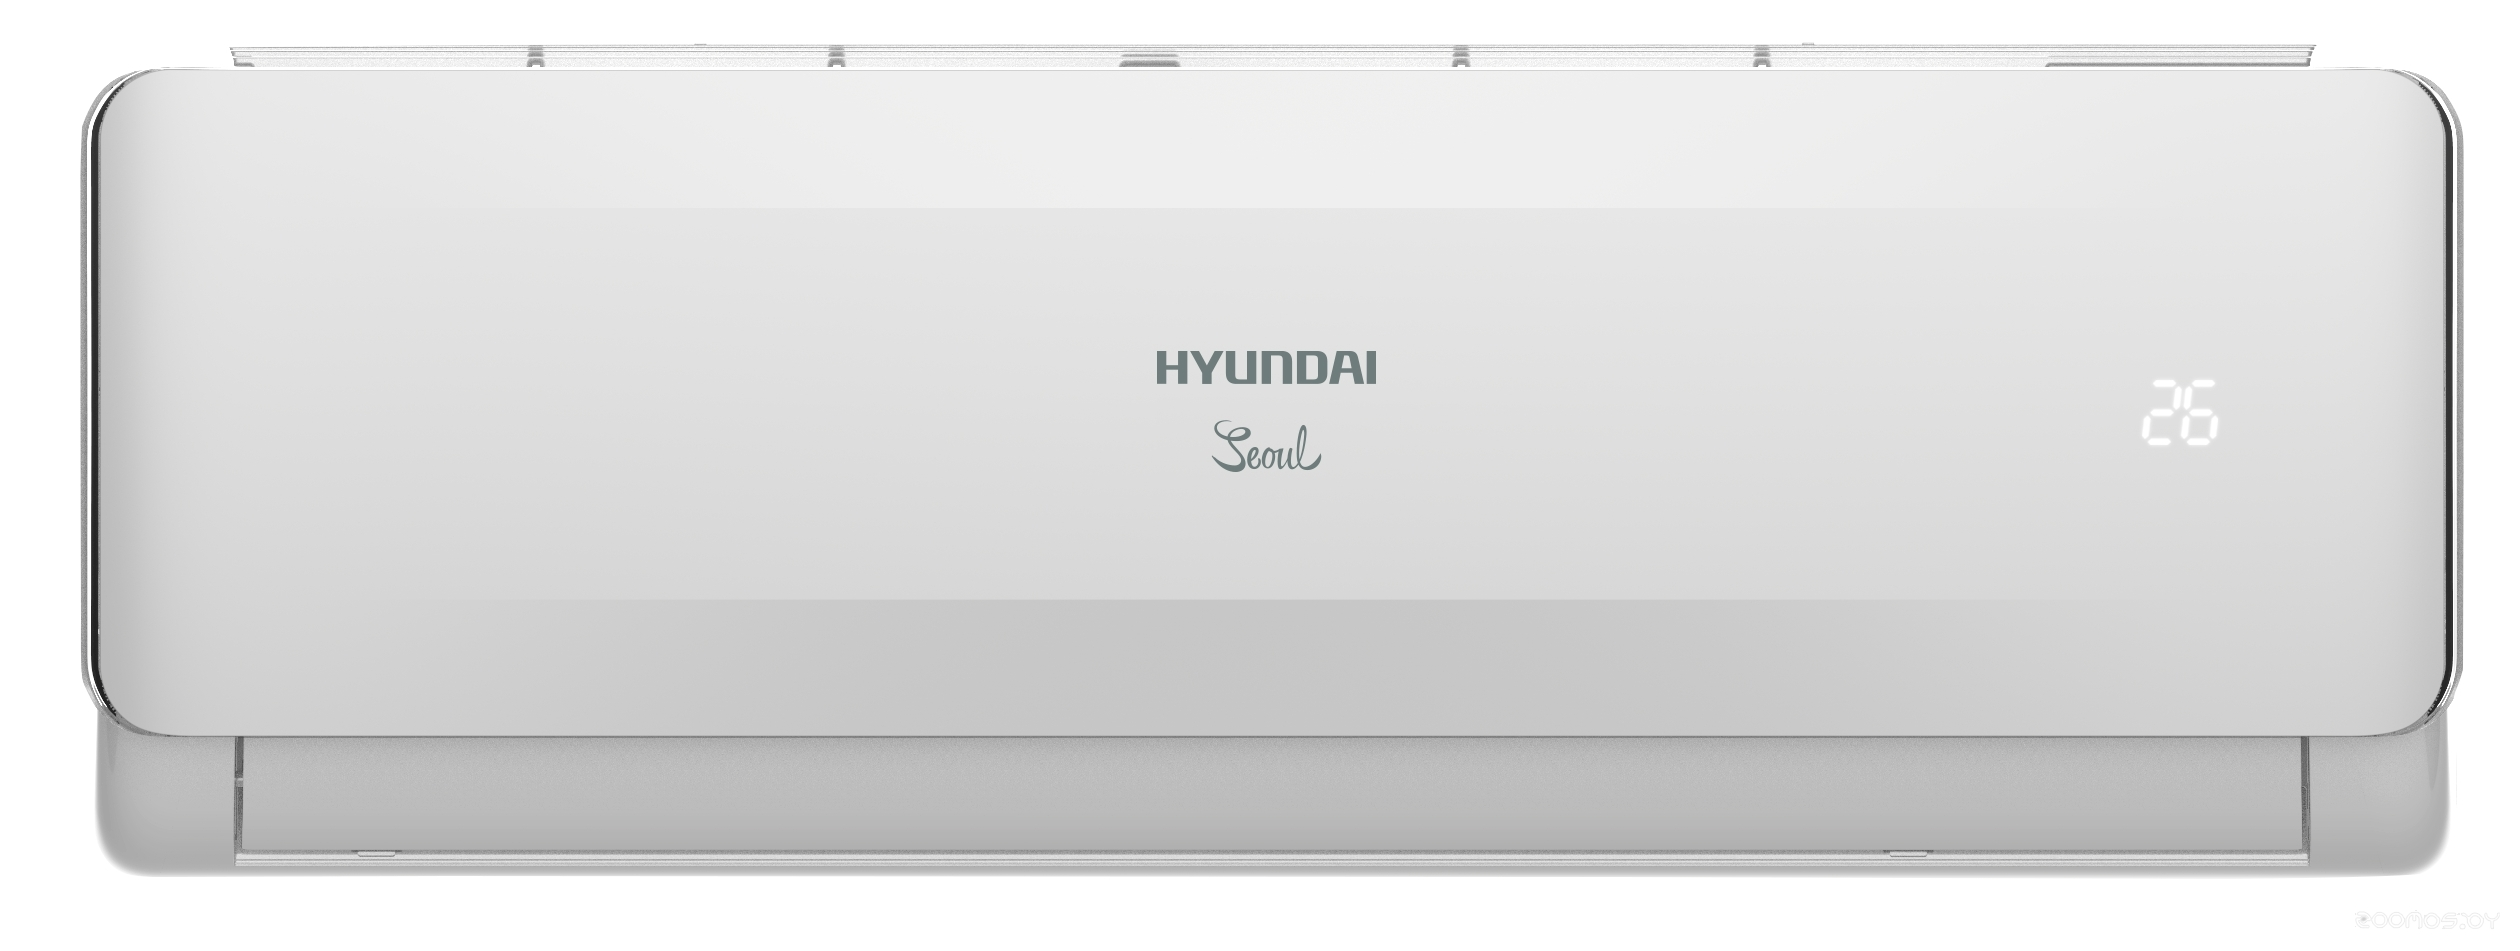 Кондиционер Hyundai Seoul H-AR19-36H/I/O